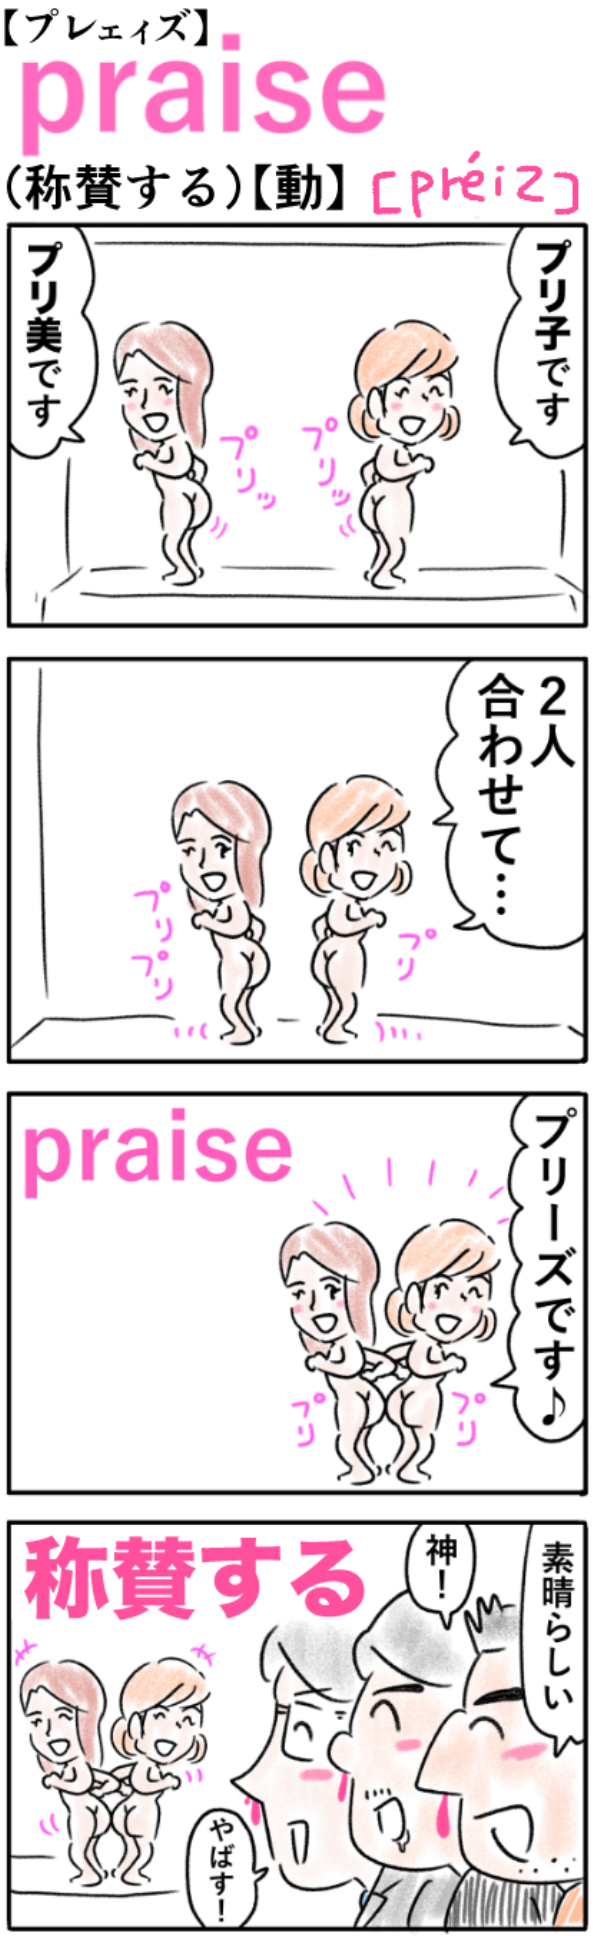 praise(称賛する)の語呂合わせ英単語